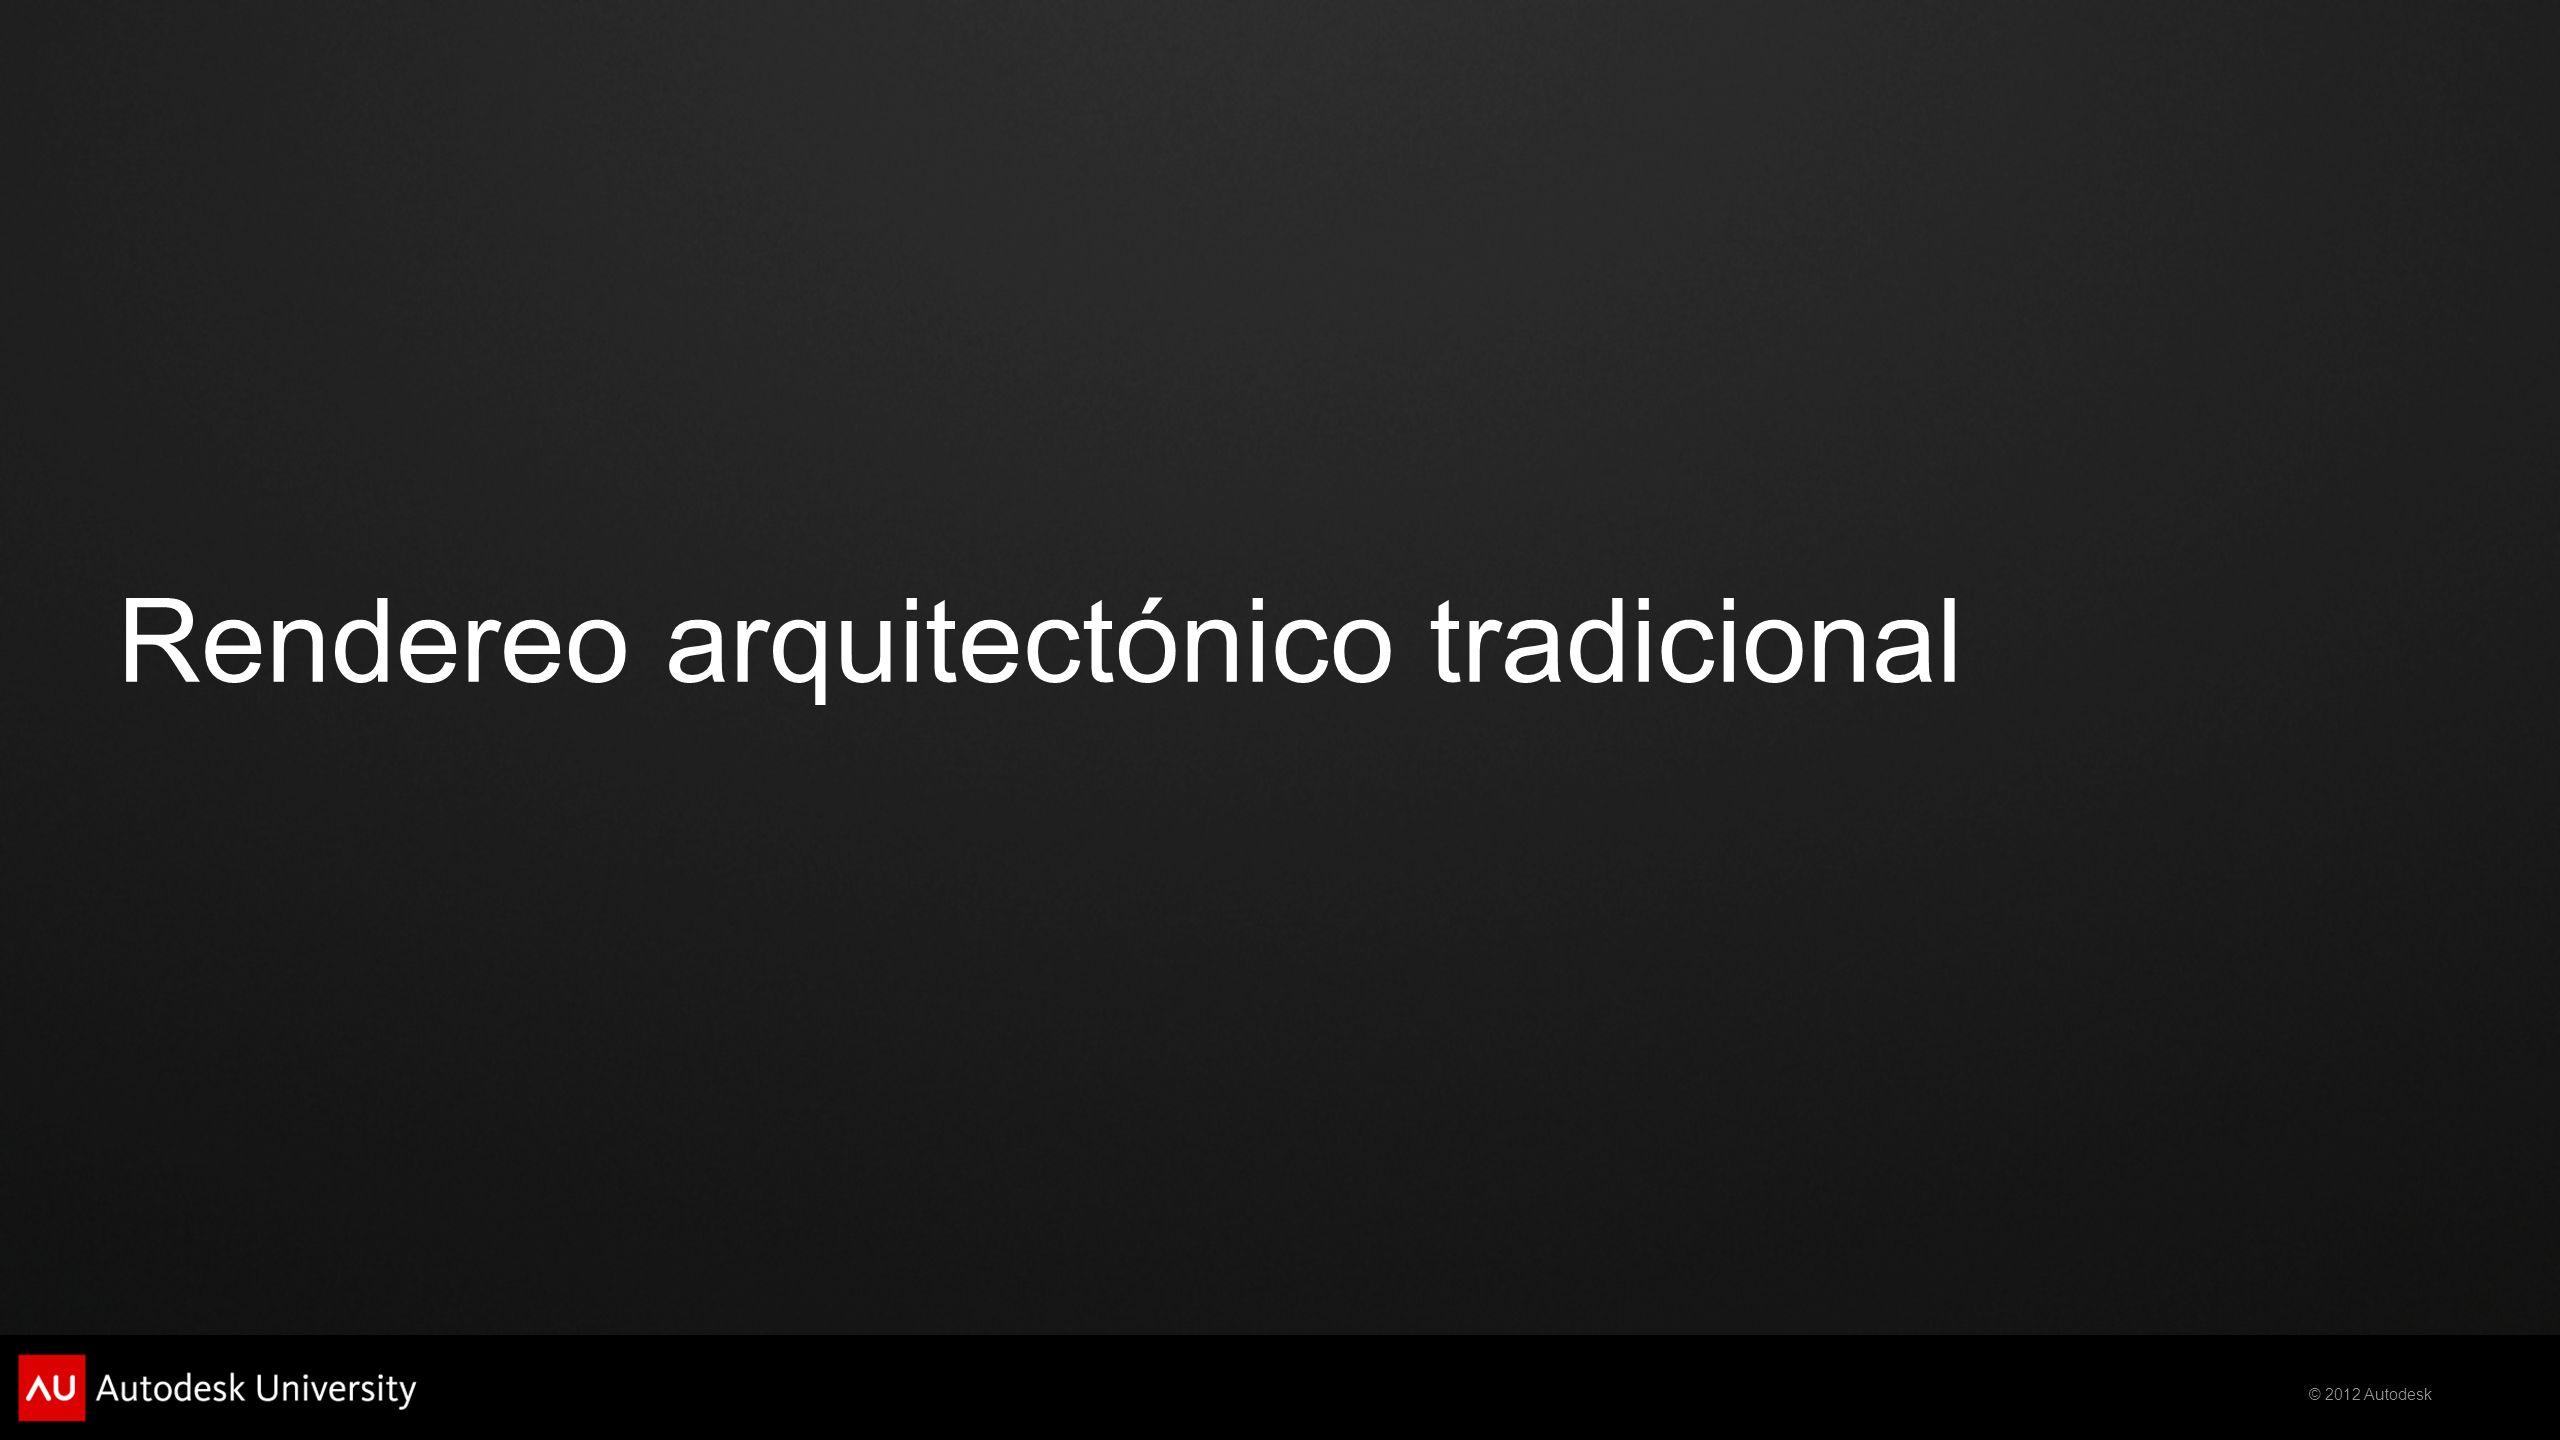 Rendereo arquitectónico tradicional